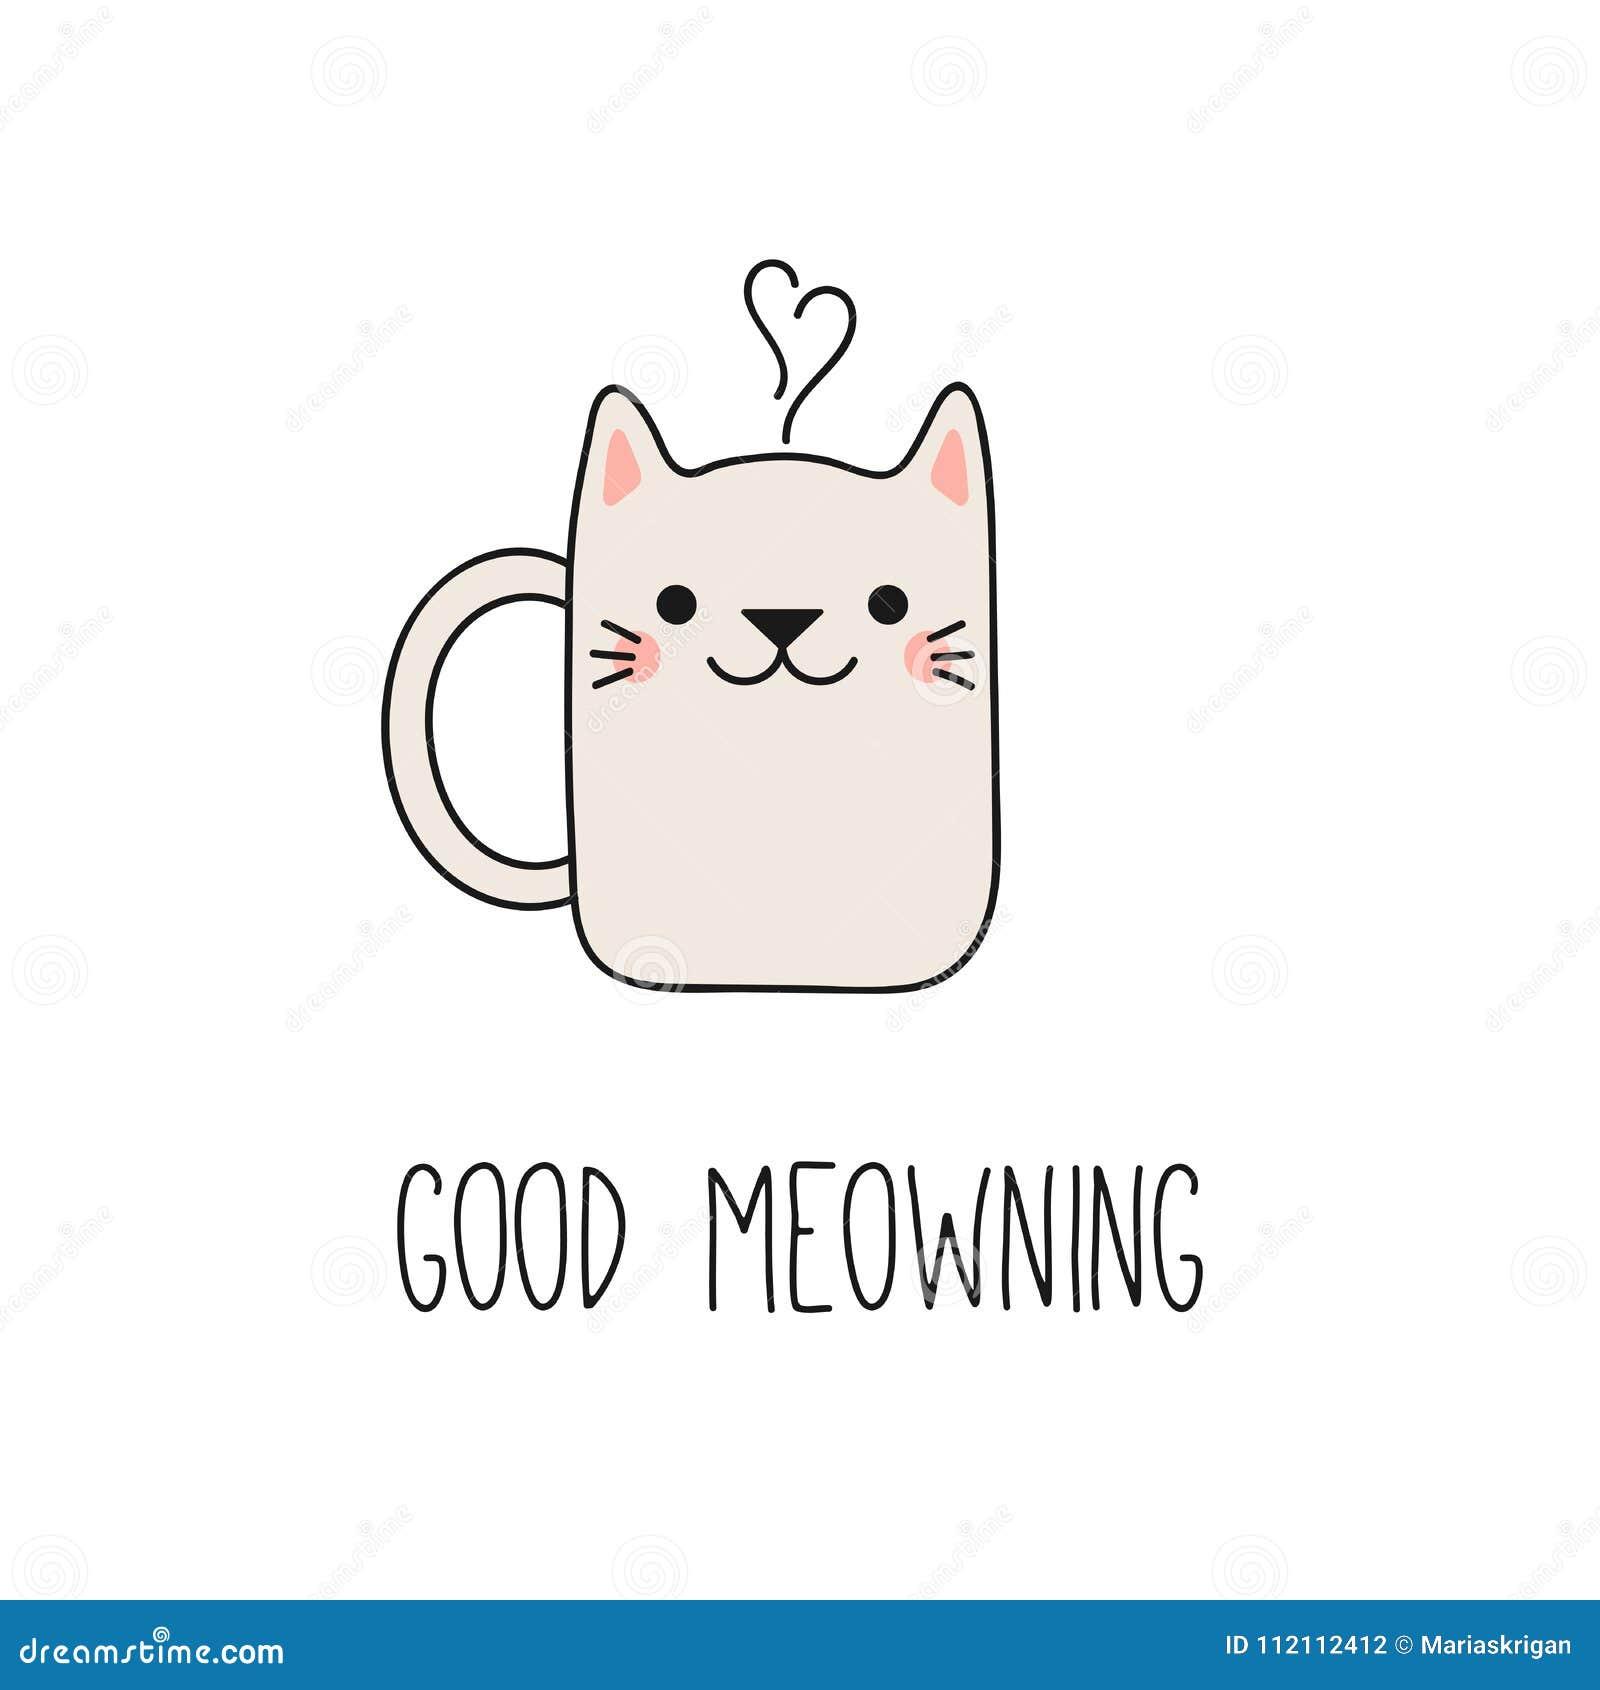 Cute Cat Mug Cup Stock Vector Illustration Of Face 112112412